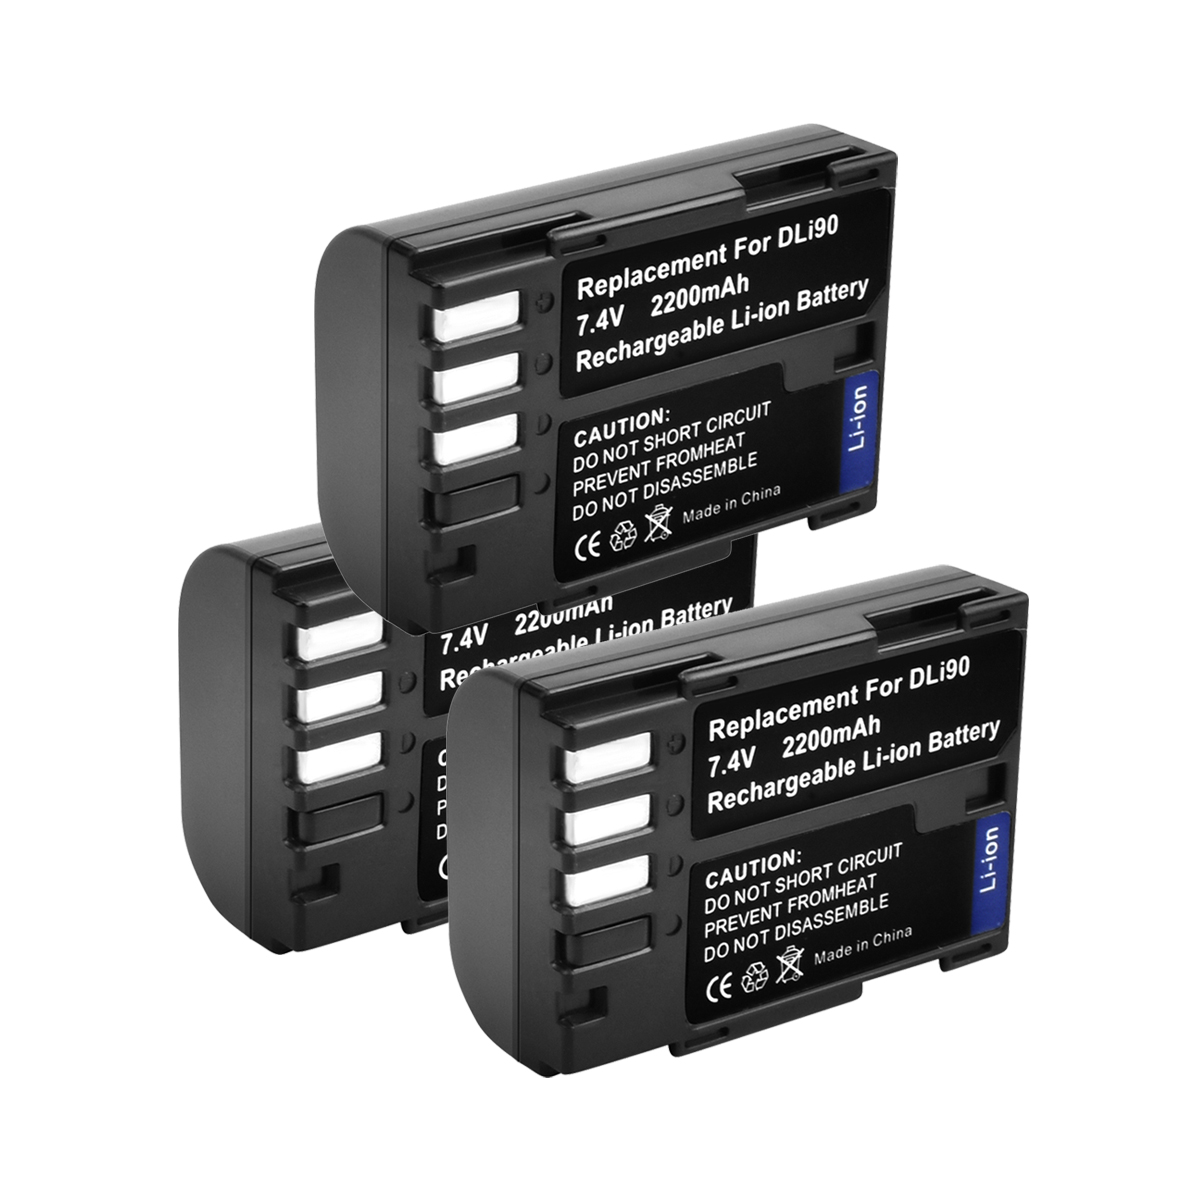 3 pcs 7.4 v 2200 mah akku D-LI90 DLI90 D LI90 Appareil Photo Numérique Batterie Pour PENTAX K-7 K-7D K-5 K-5 II 645D K01 K-3 K-3 II 645Z L15